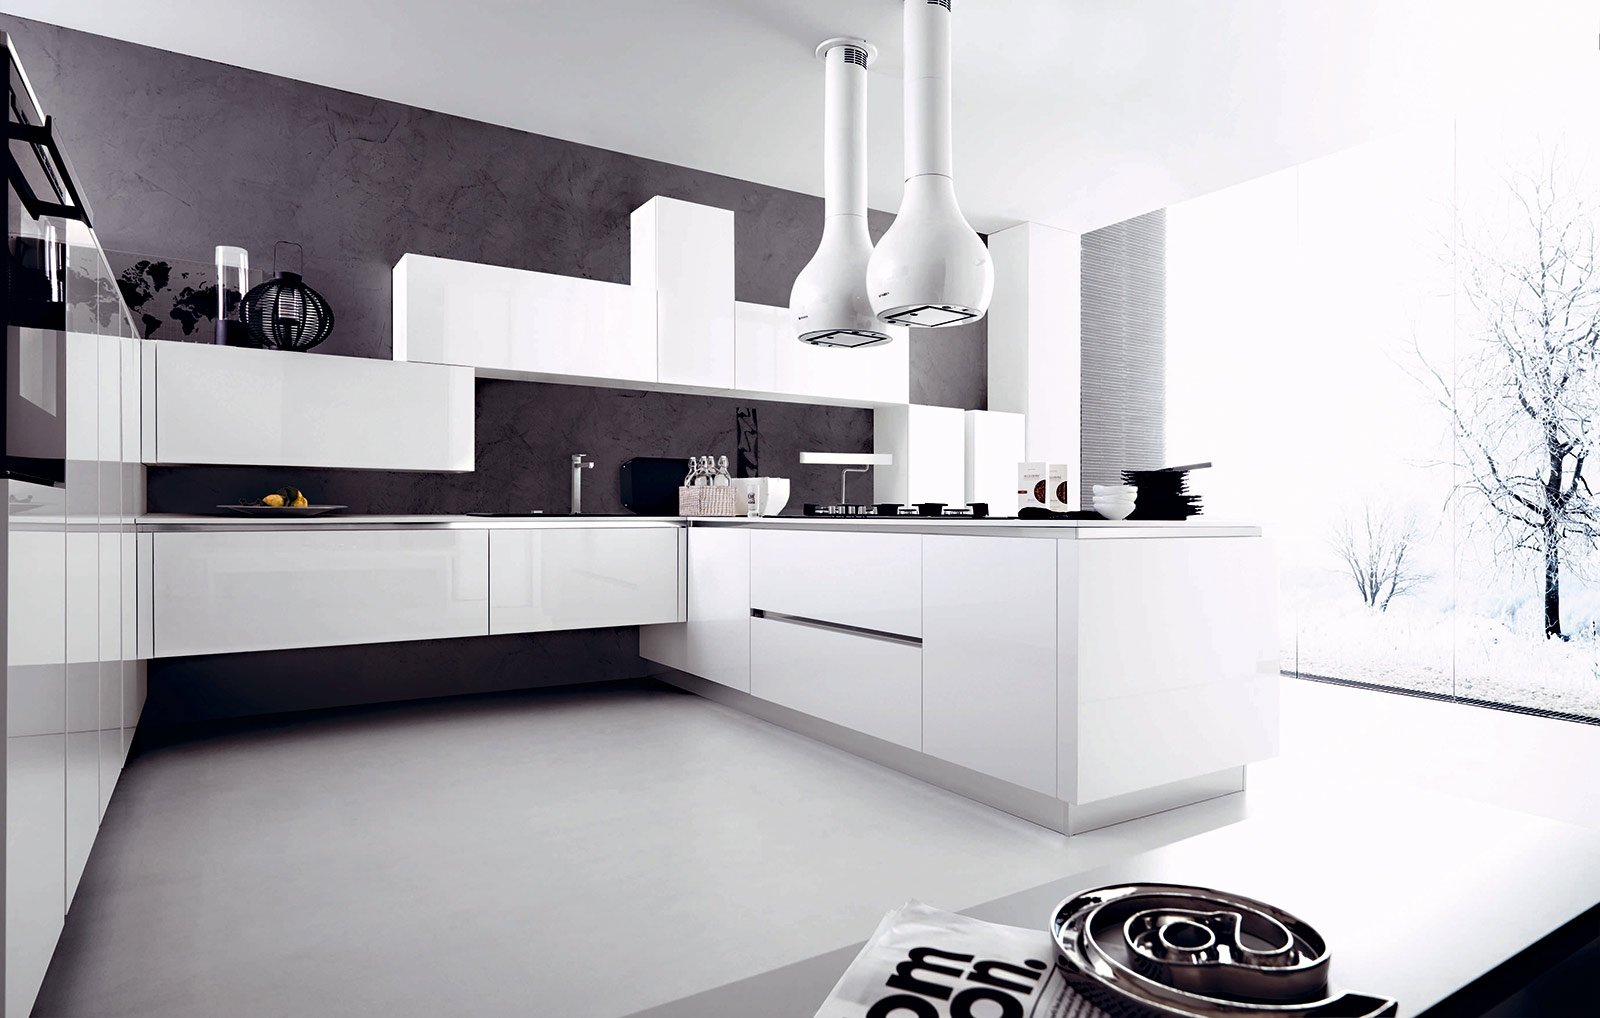 Cucina la voglio tutta bianca cose di casa - Vernice per ante cucina ...